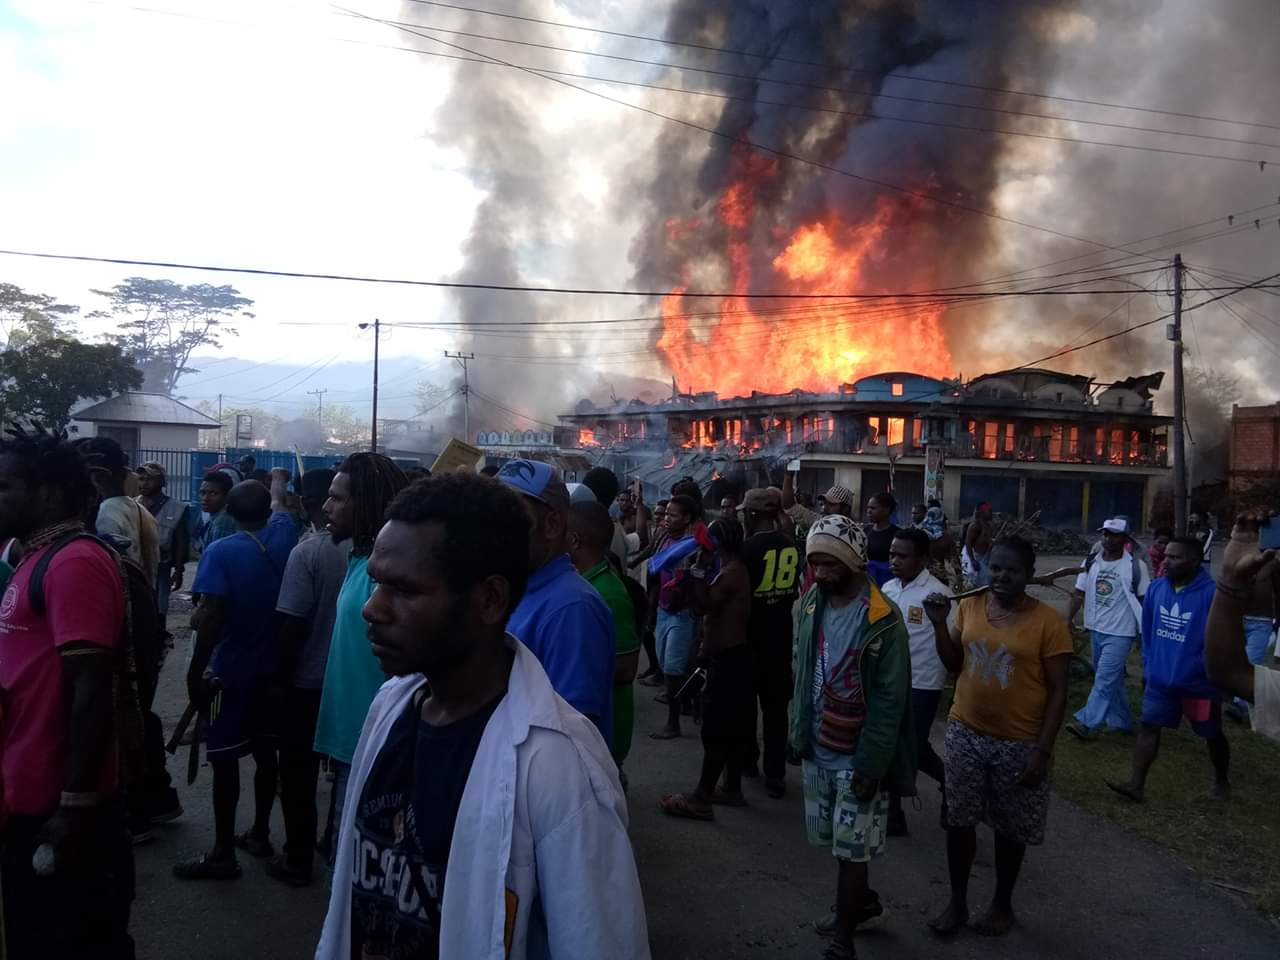 https: img-z.okeinfo.net content 2019 09 24 337 2108740 istana-prihatin-26-orang-tewas-akibat-kerusuhan-di-wamena-papua-0qWuFzWcpc.jpg